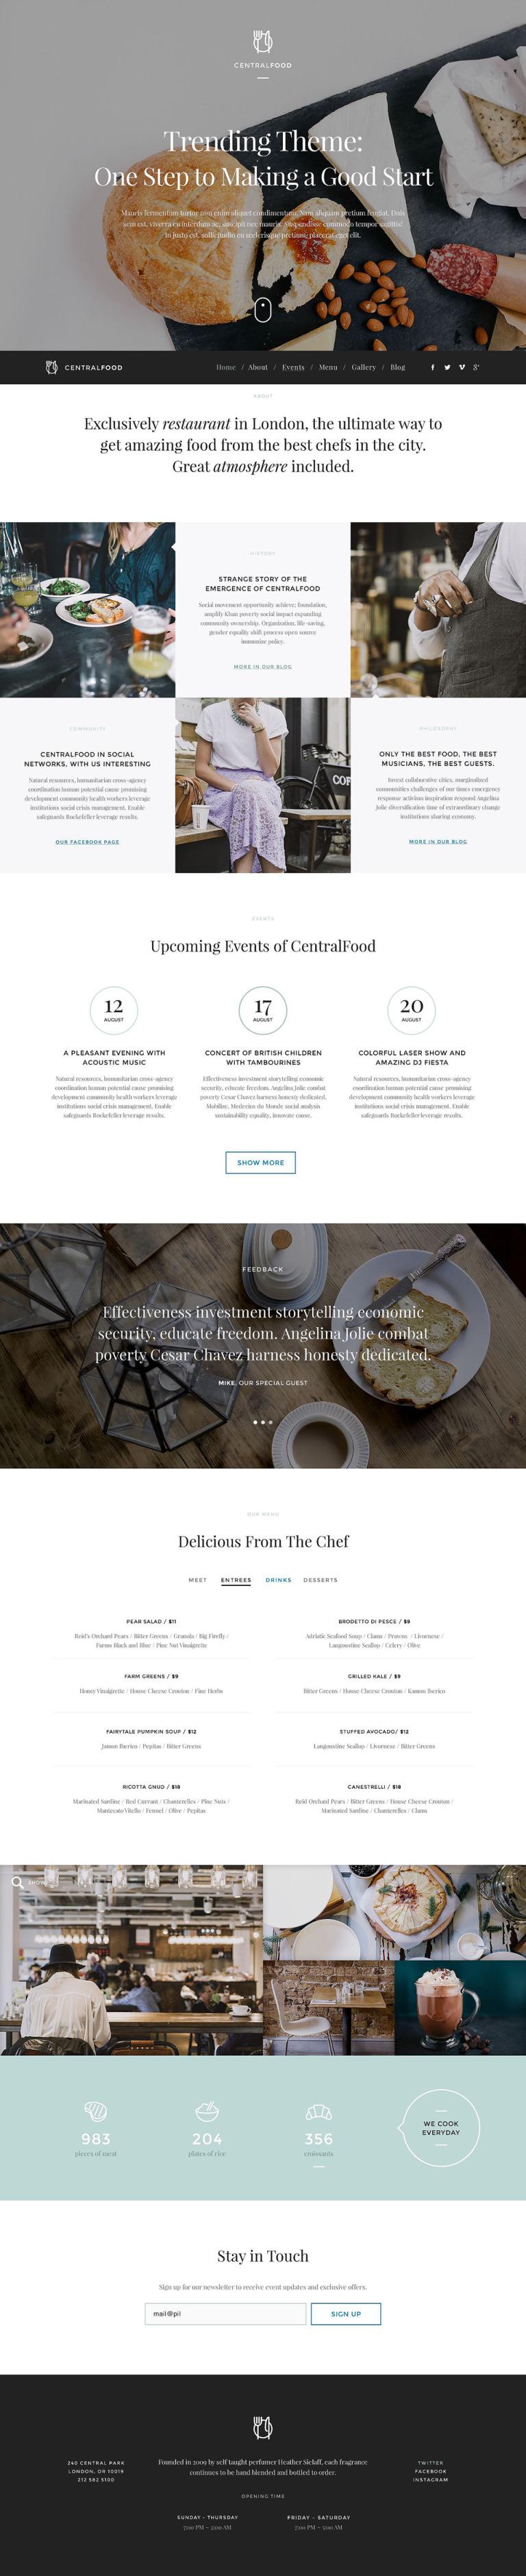 Cafe and Restaurant Responsive WordPress Theme New Screenshots BIG